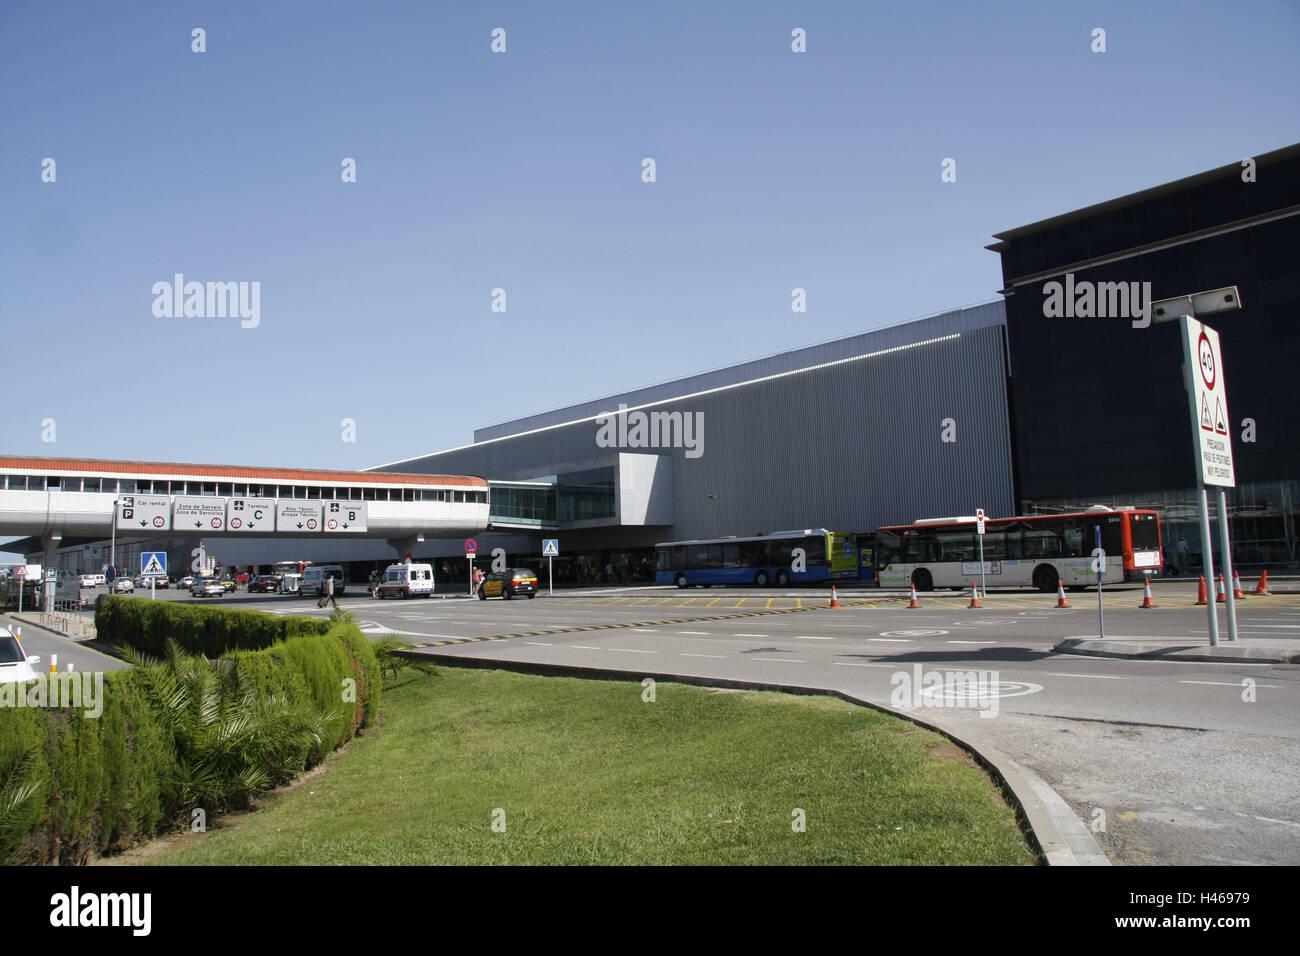 Spain, Catalonia, Barcelona, airport, terminal, access road, street, Europe, destination, airport terminal, building, - Stock Image